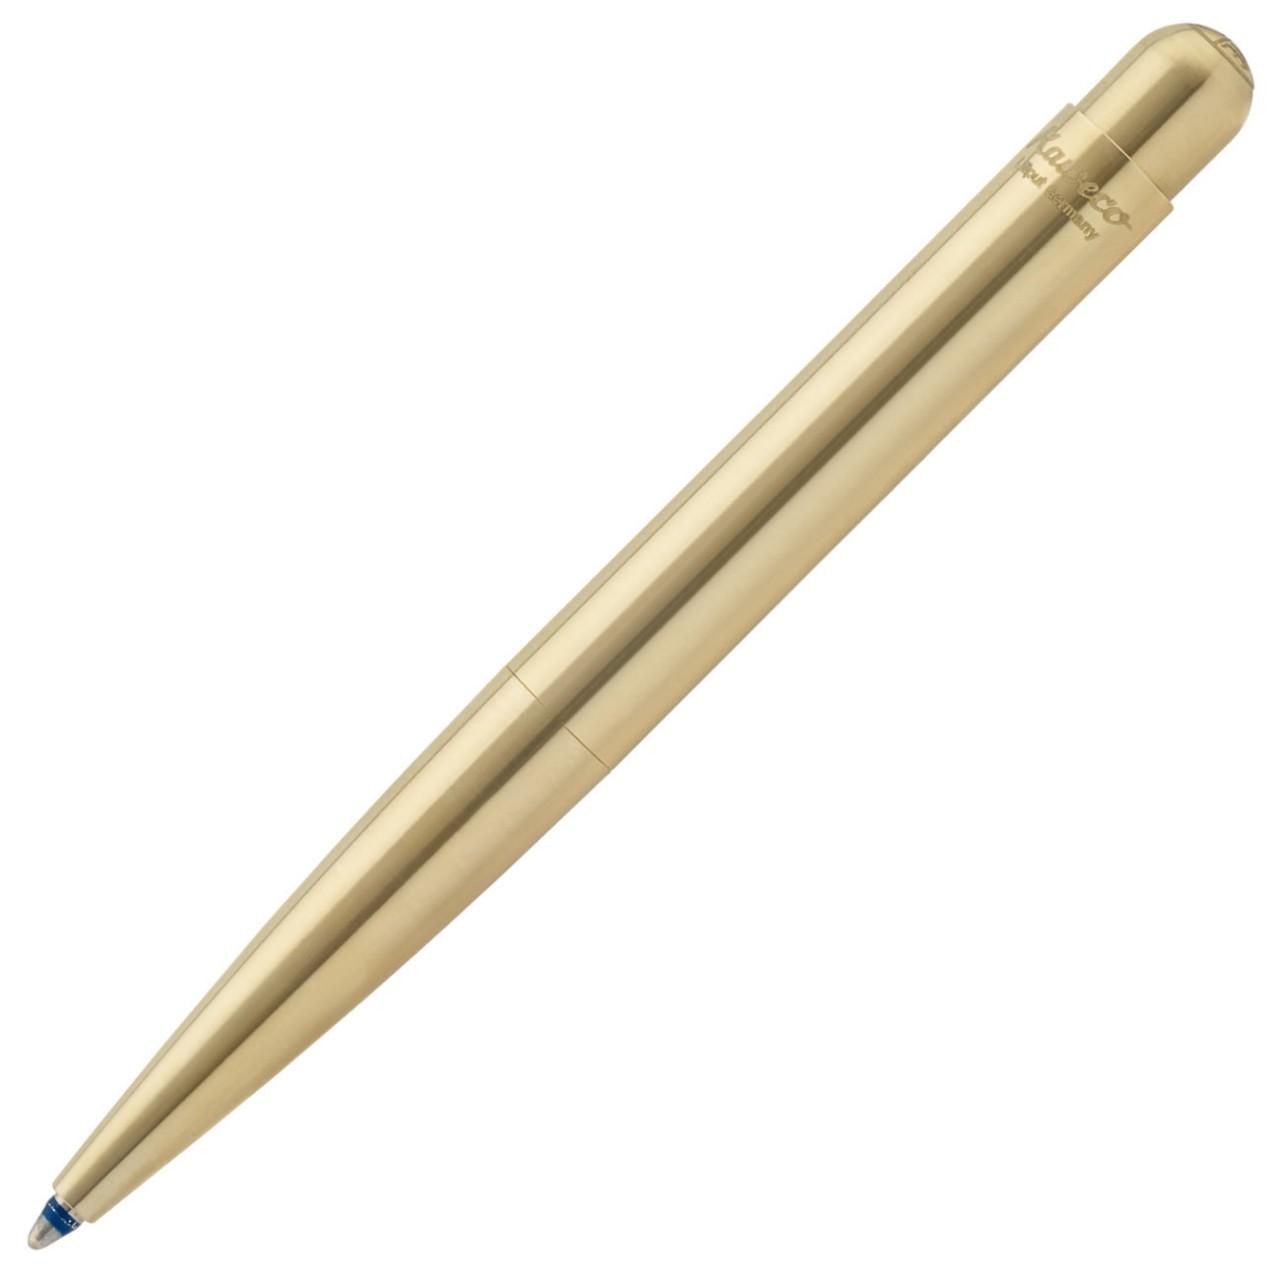 Kaweco LILIPUT Ms glatt Kugelschreiber